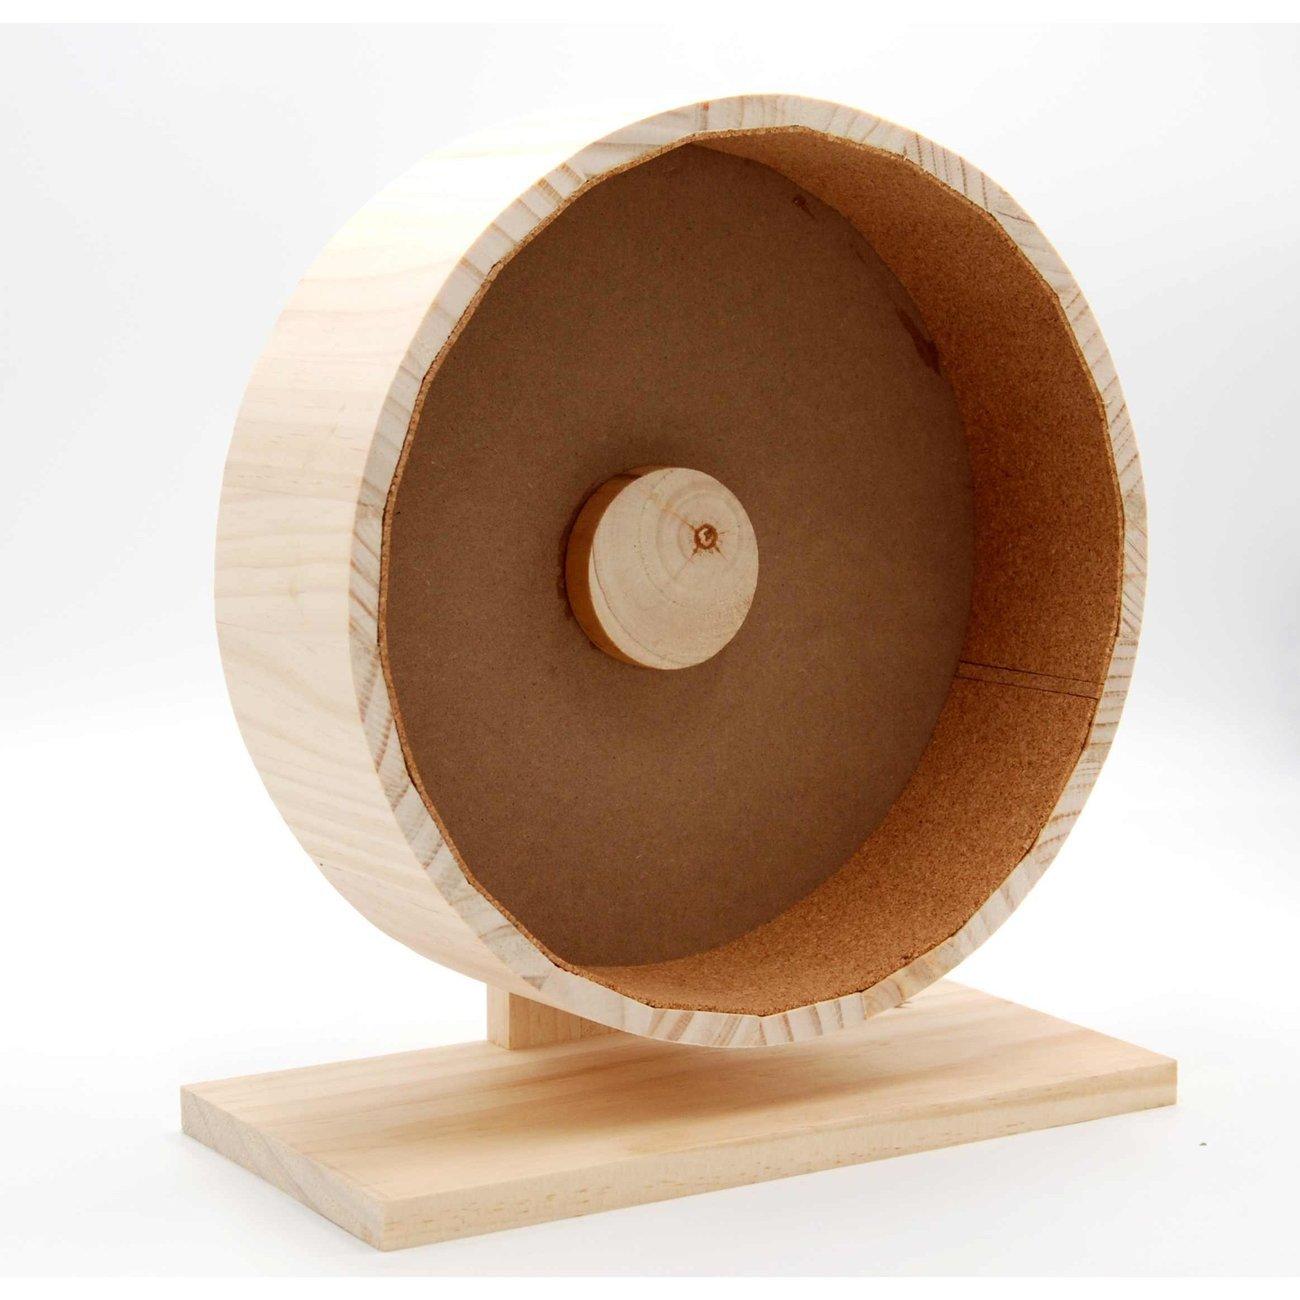 HUGRO® Nagertrainer Laufrad, Ø 29 cm